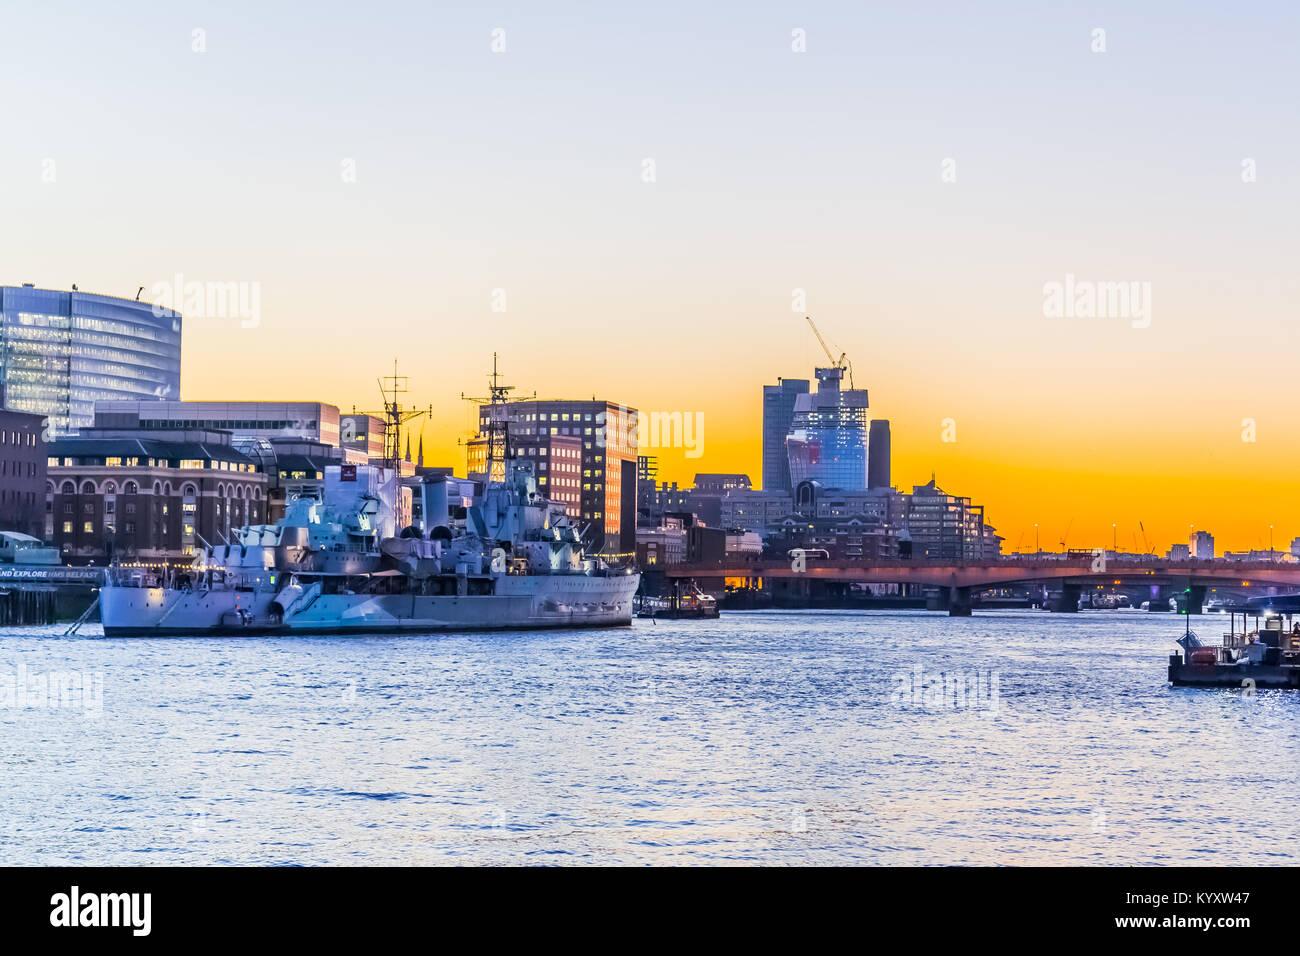 HMS Belfast, Embankment / River Thames, London Stock Photo